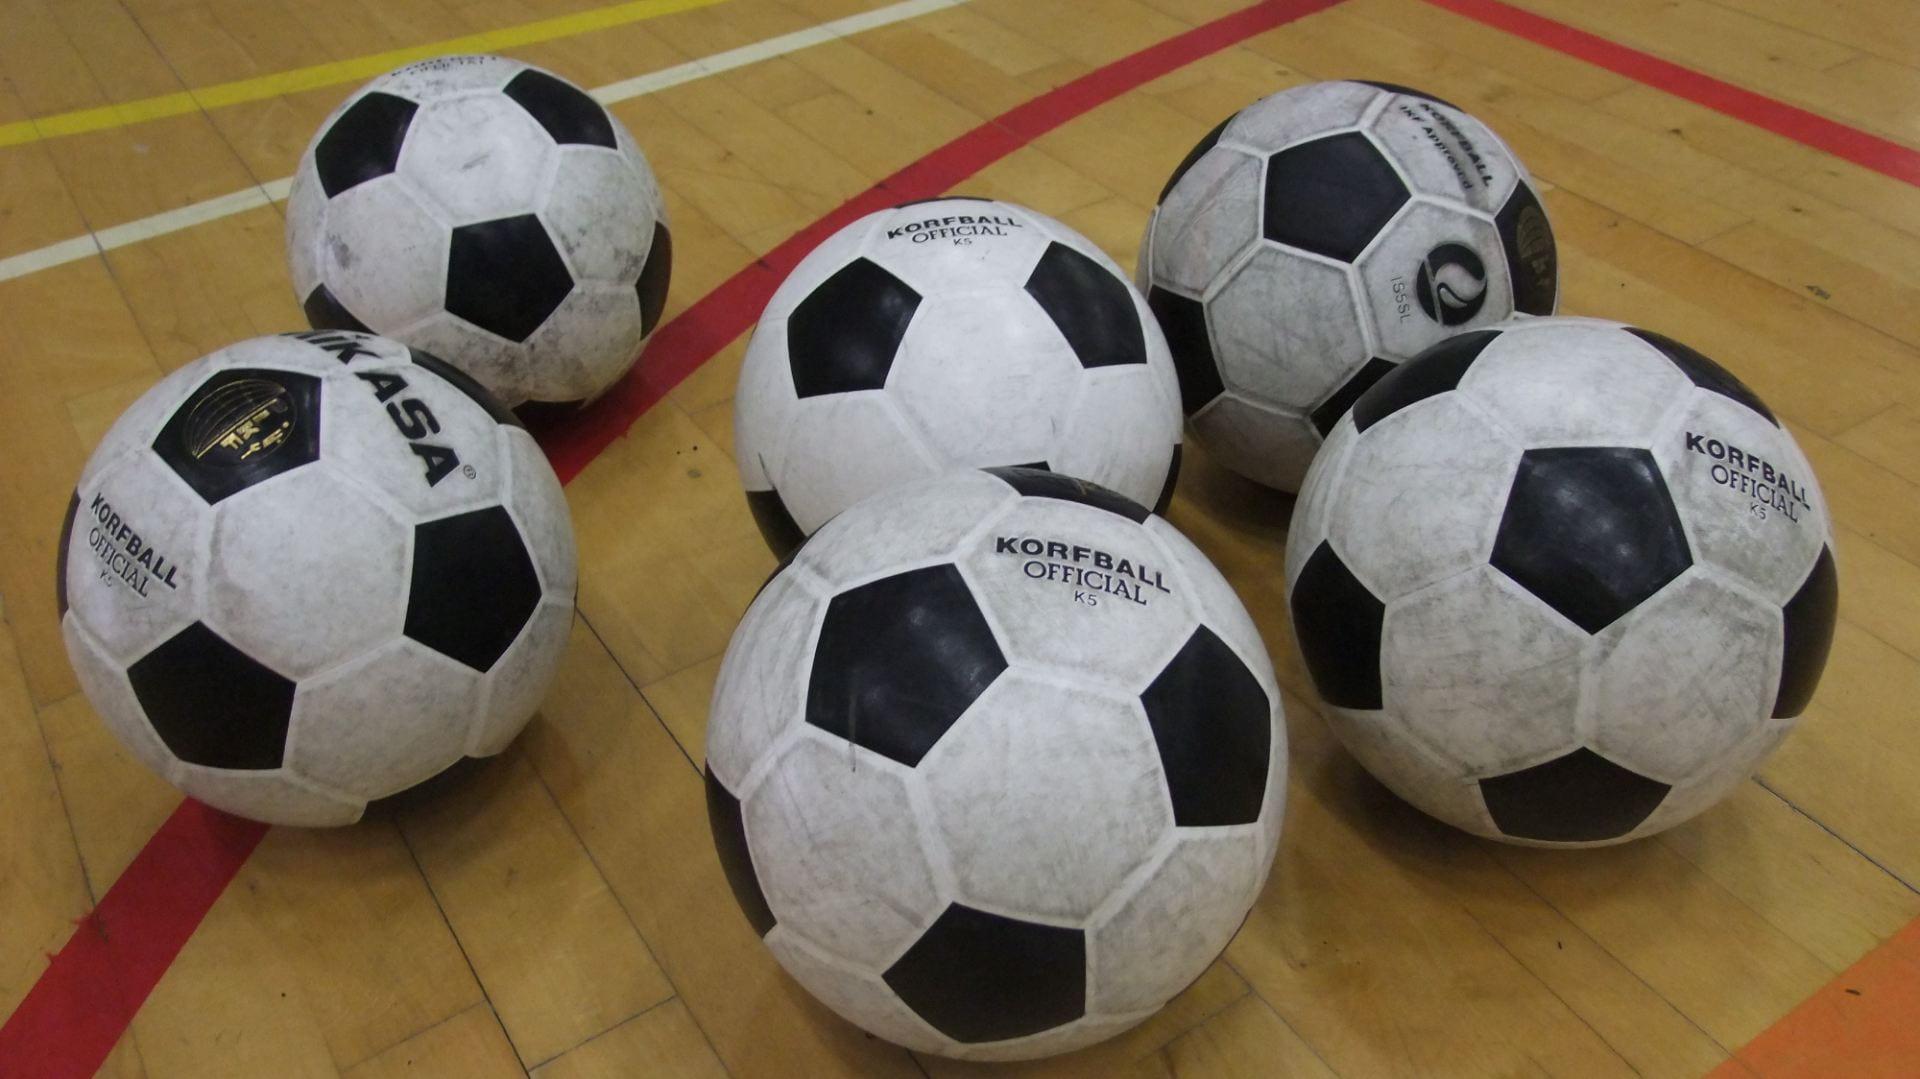 a photo of balls